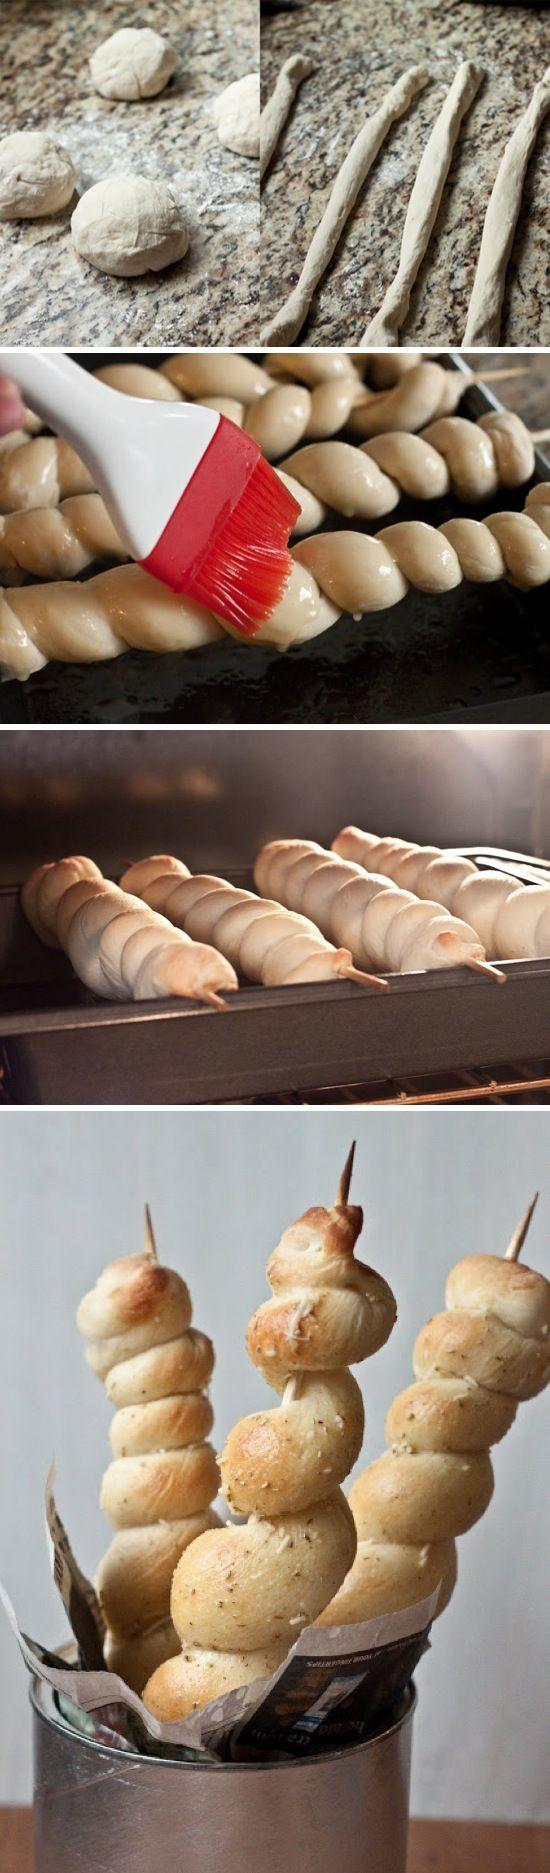 Buttery Bread Twists | Recipe By Photo